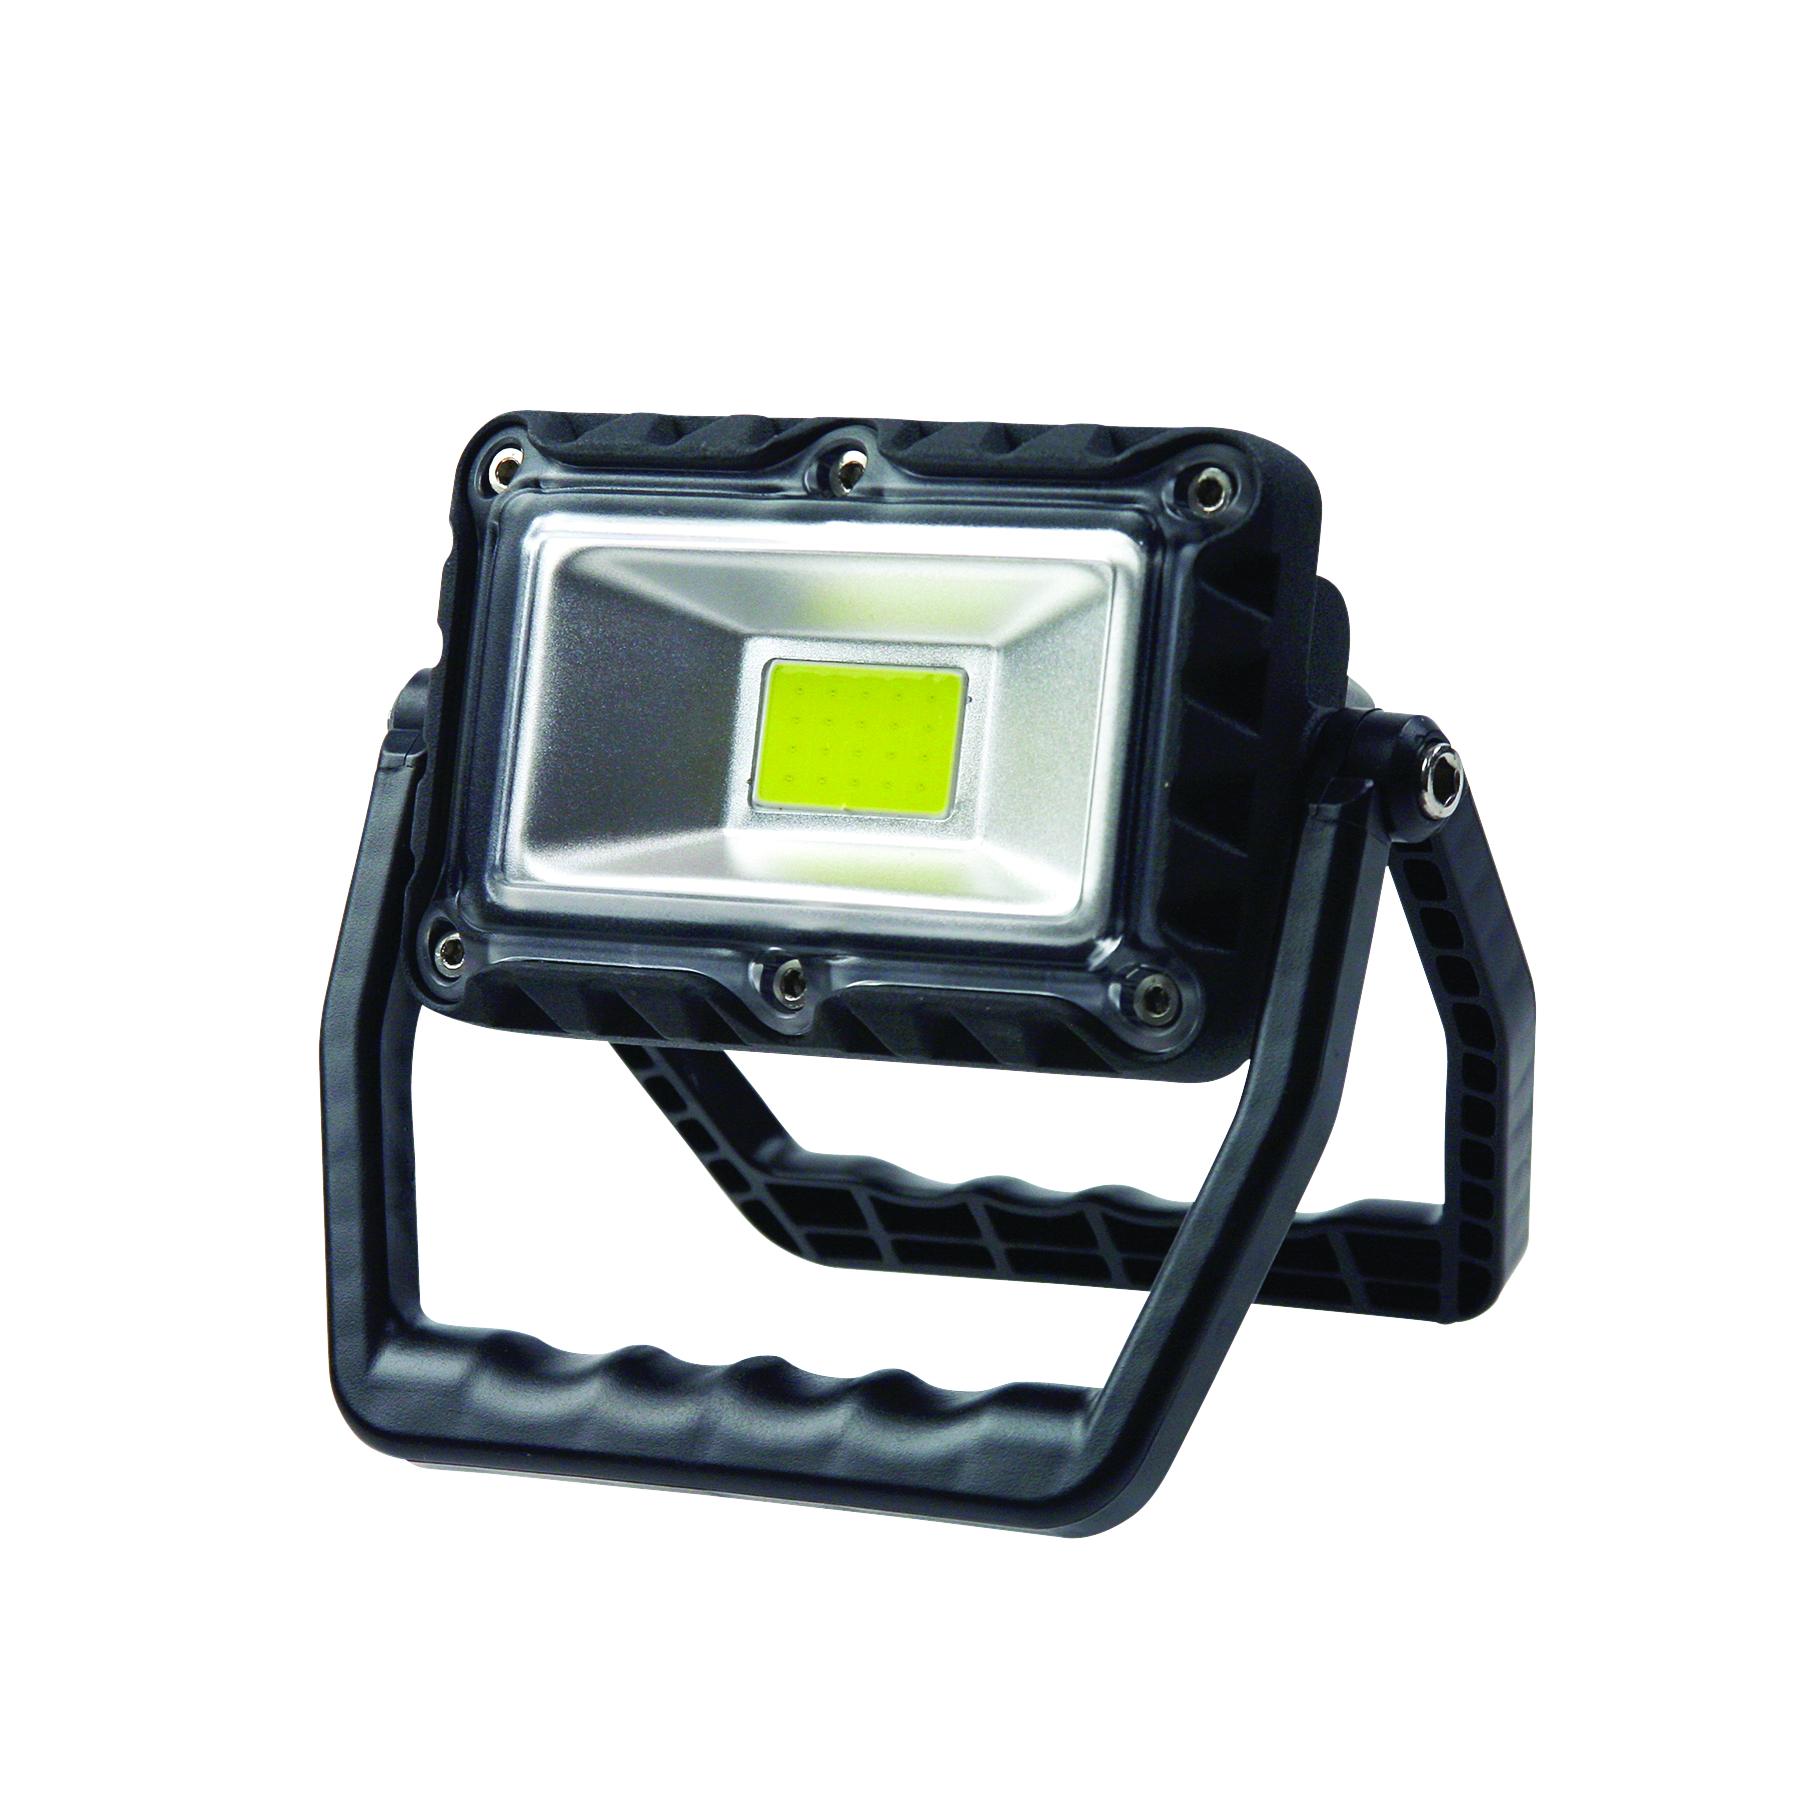 BOGO -COB LED USB RECHARGEABLE PORTABLE WORK LIGHT 1160 Lumens $47.99